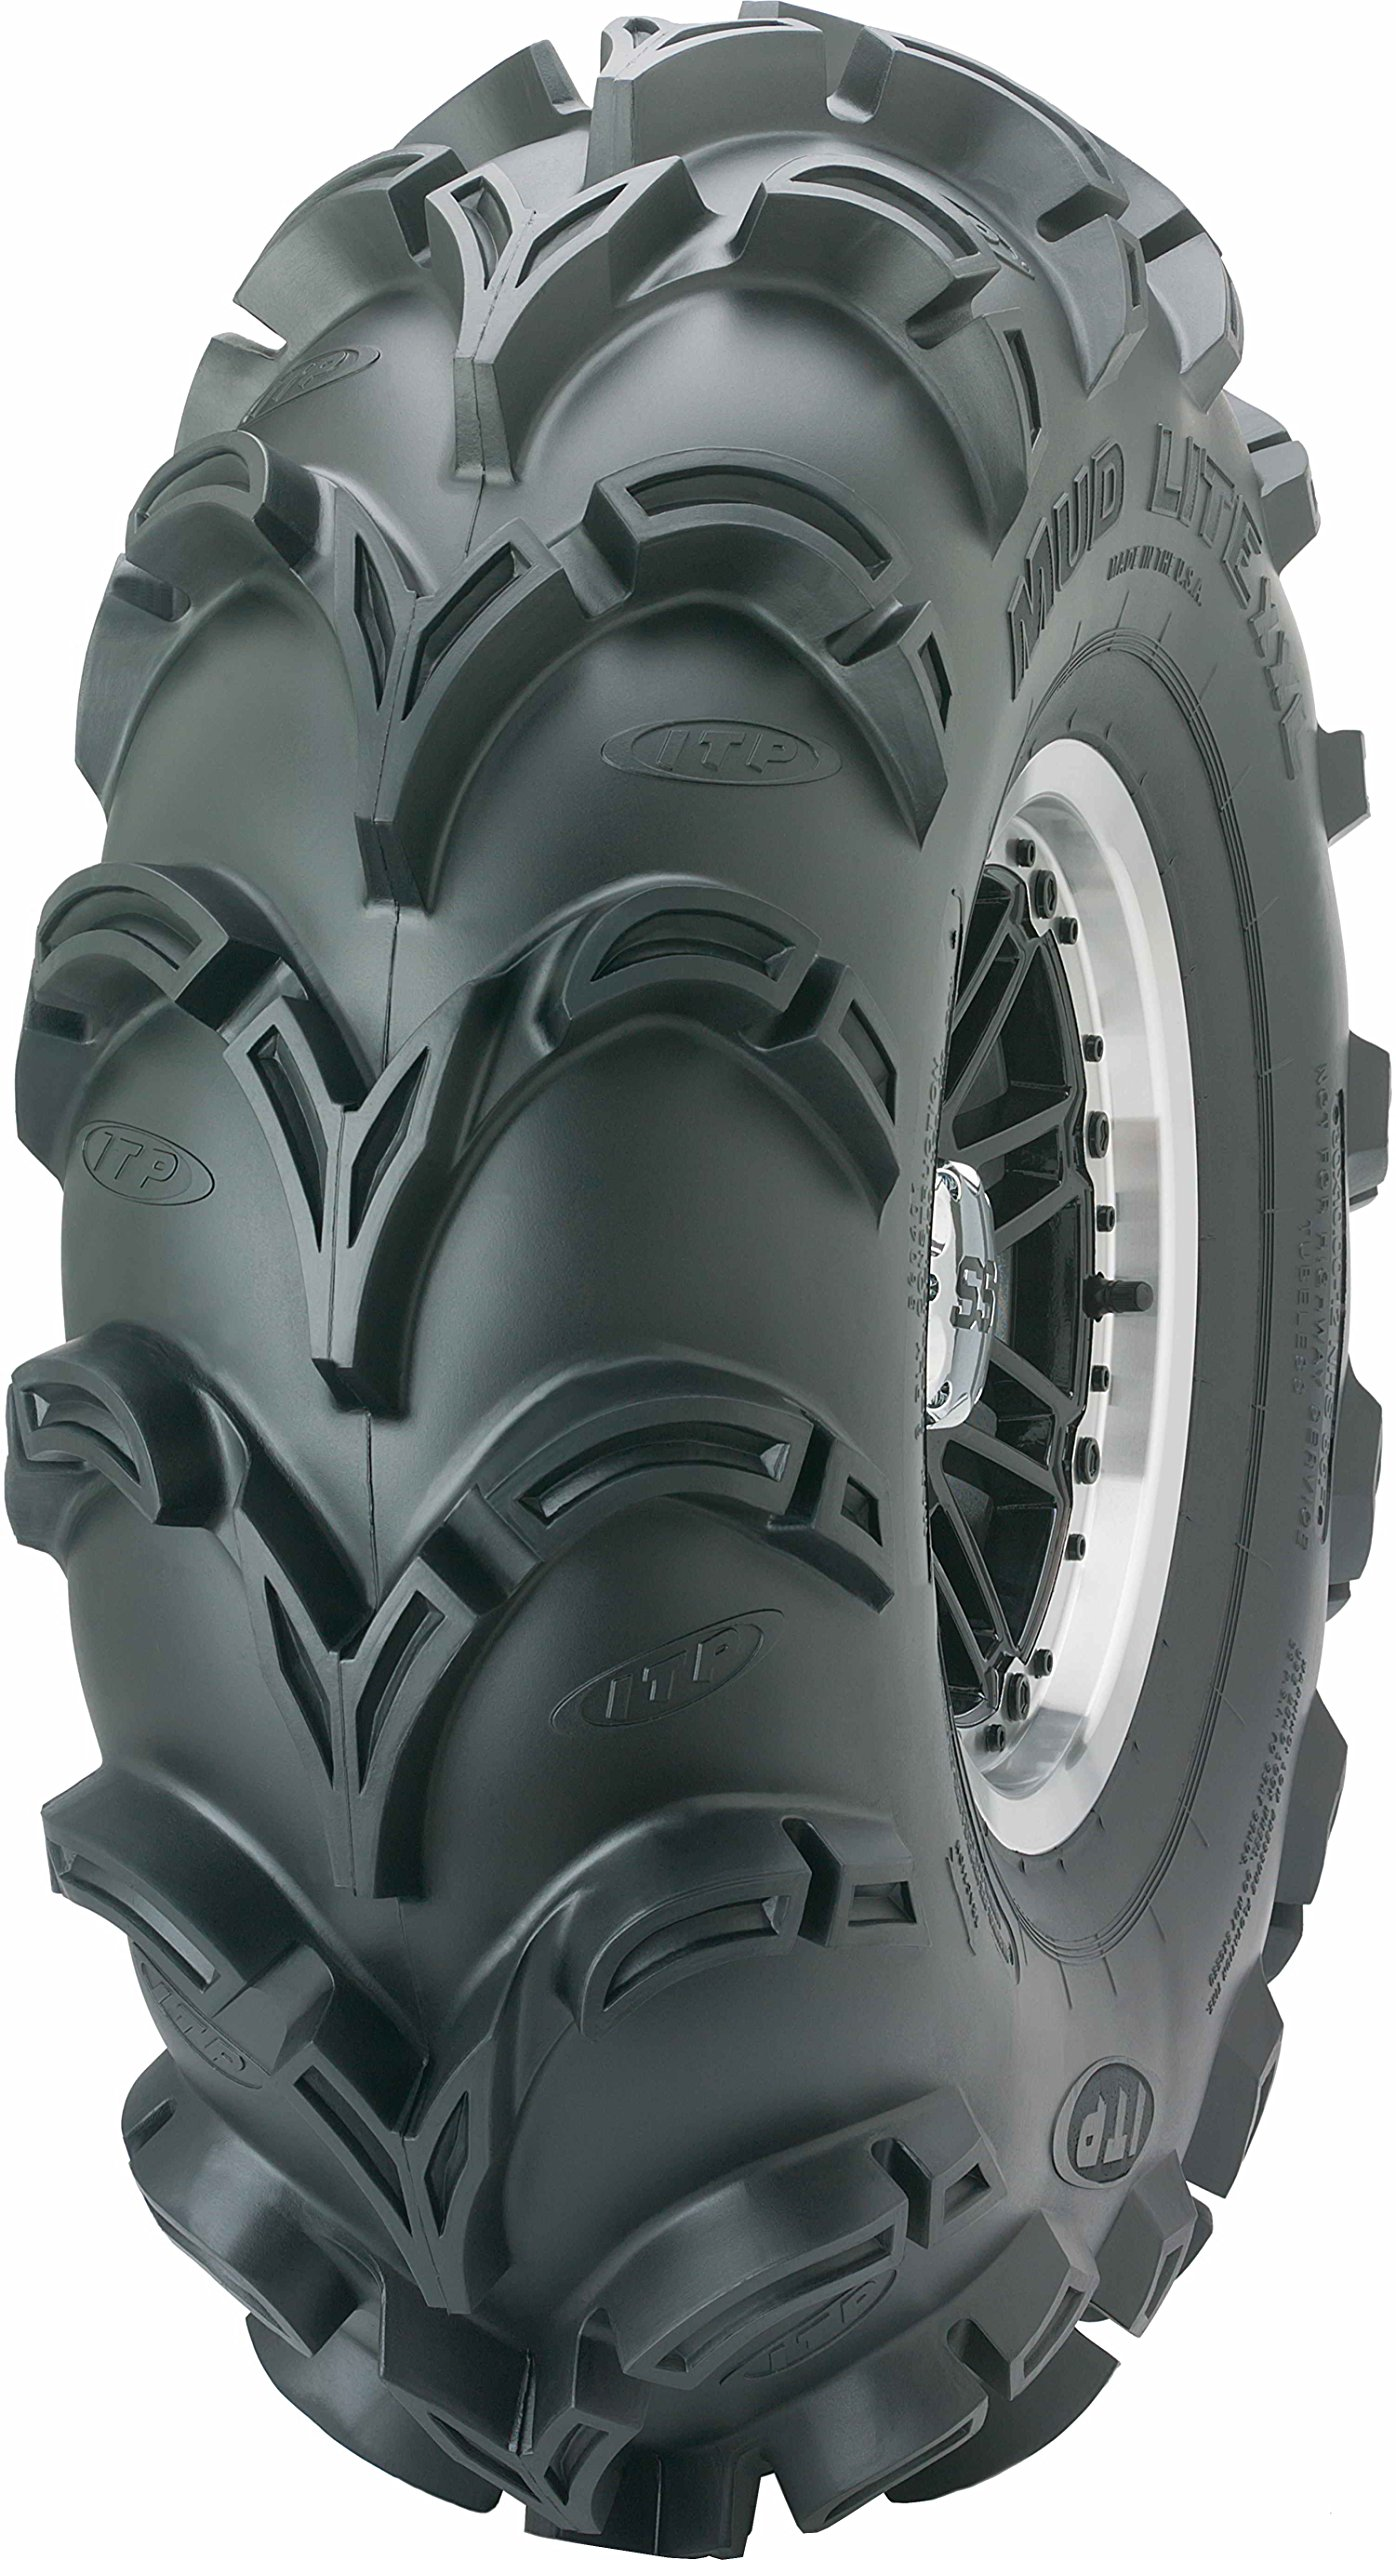 ITP Mud Lite XXL Mud Terrain ATV Tire 30x10-14